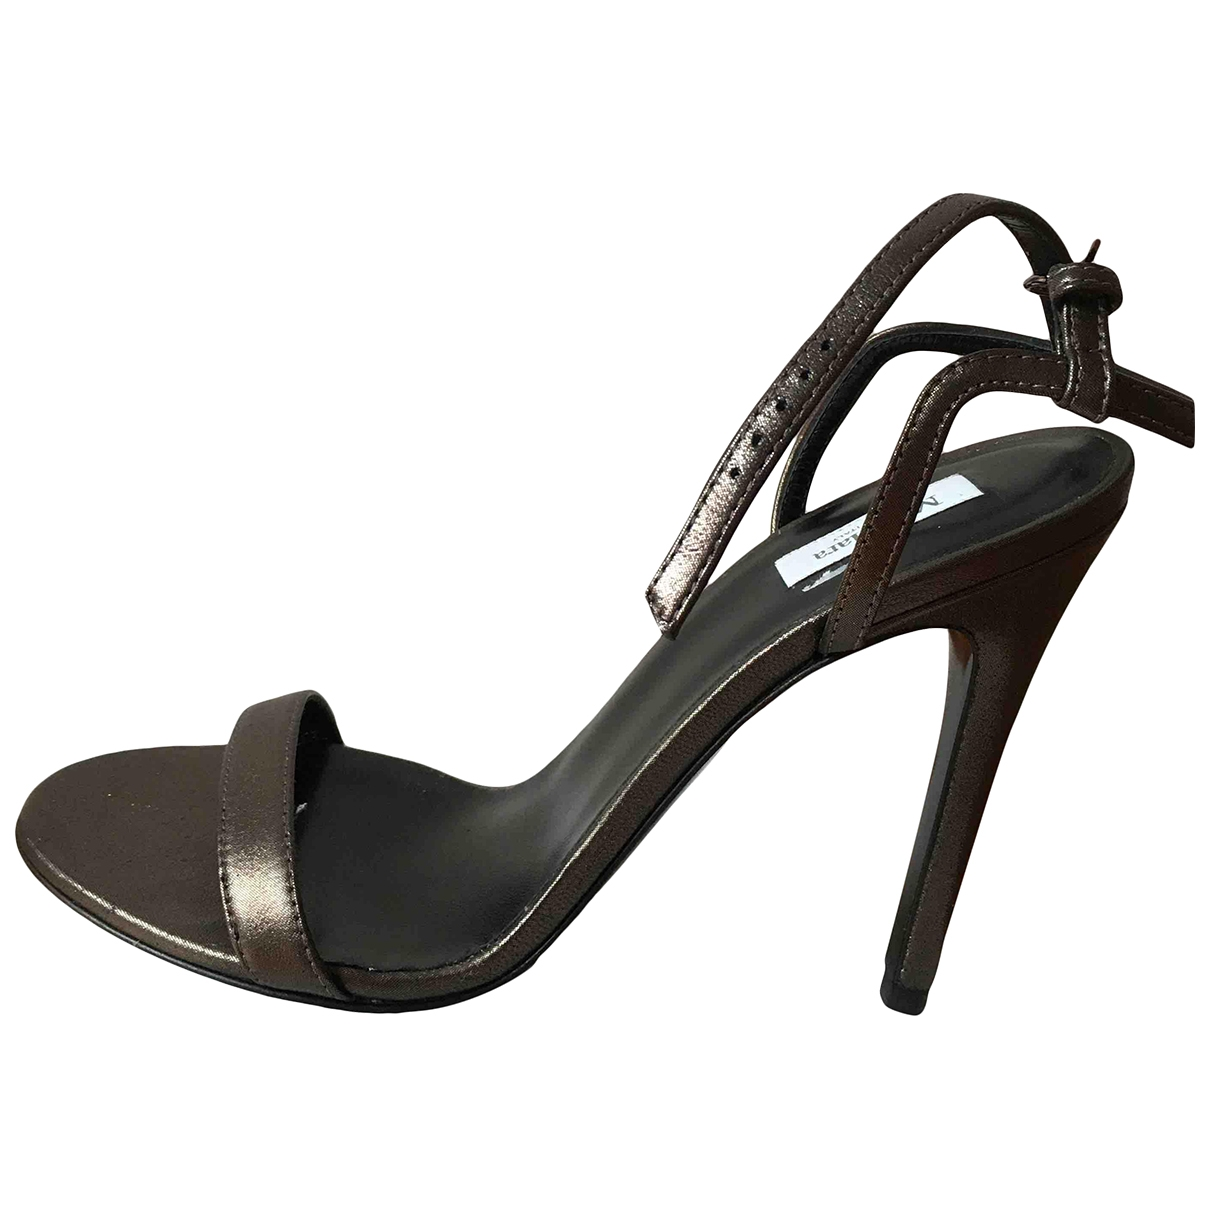 Max Mara \N Cloth Sandals for Women 39 EU